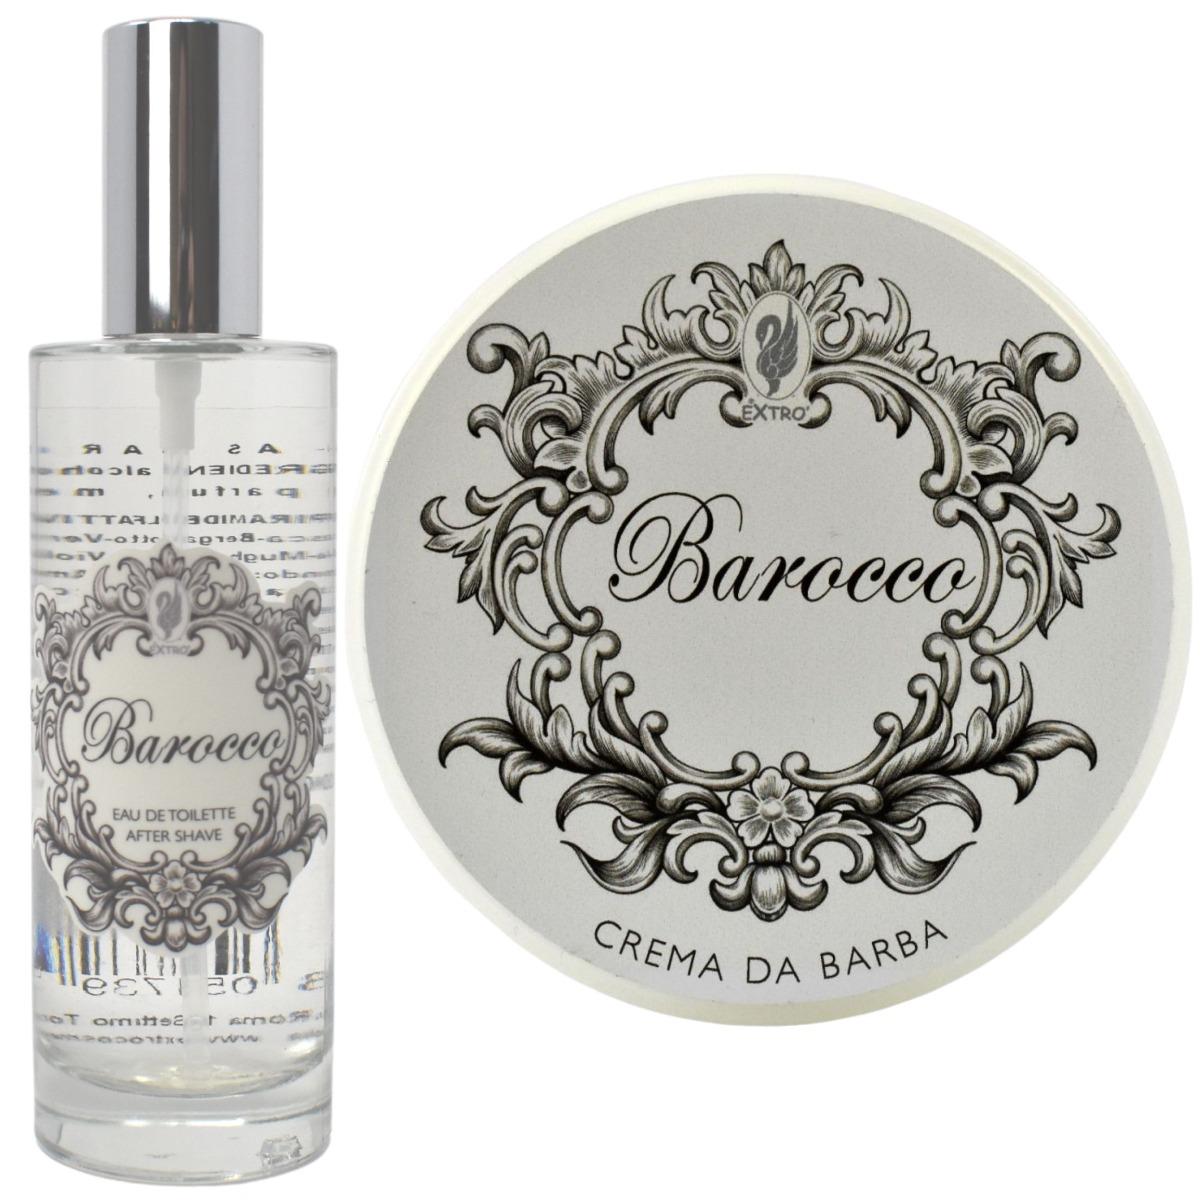 Extro Cosmesi Barocco Shaving Cream & Aftershave Set